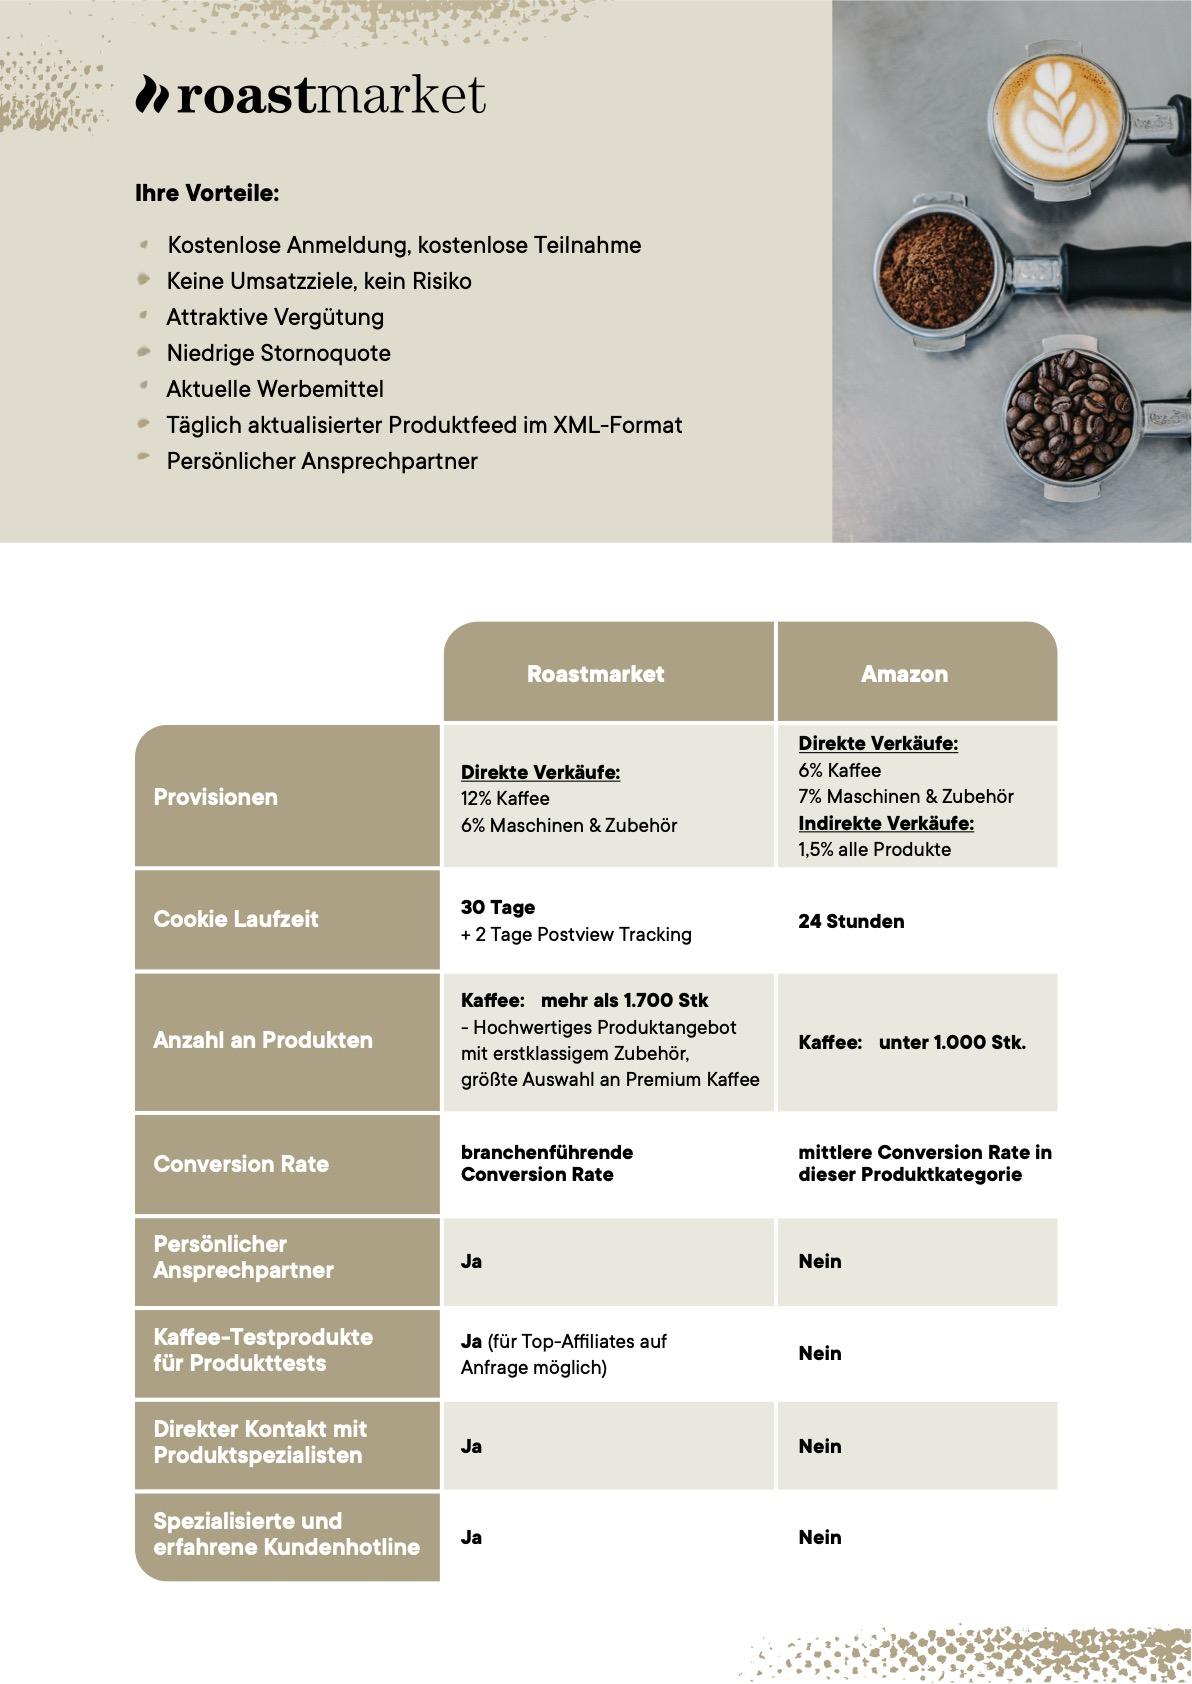 Vorteile des roastmarket Affiliate-Partnerprogramms